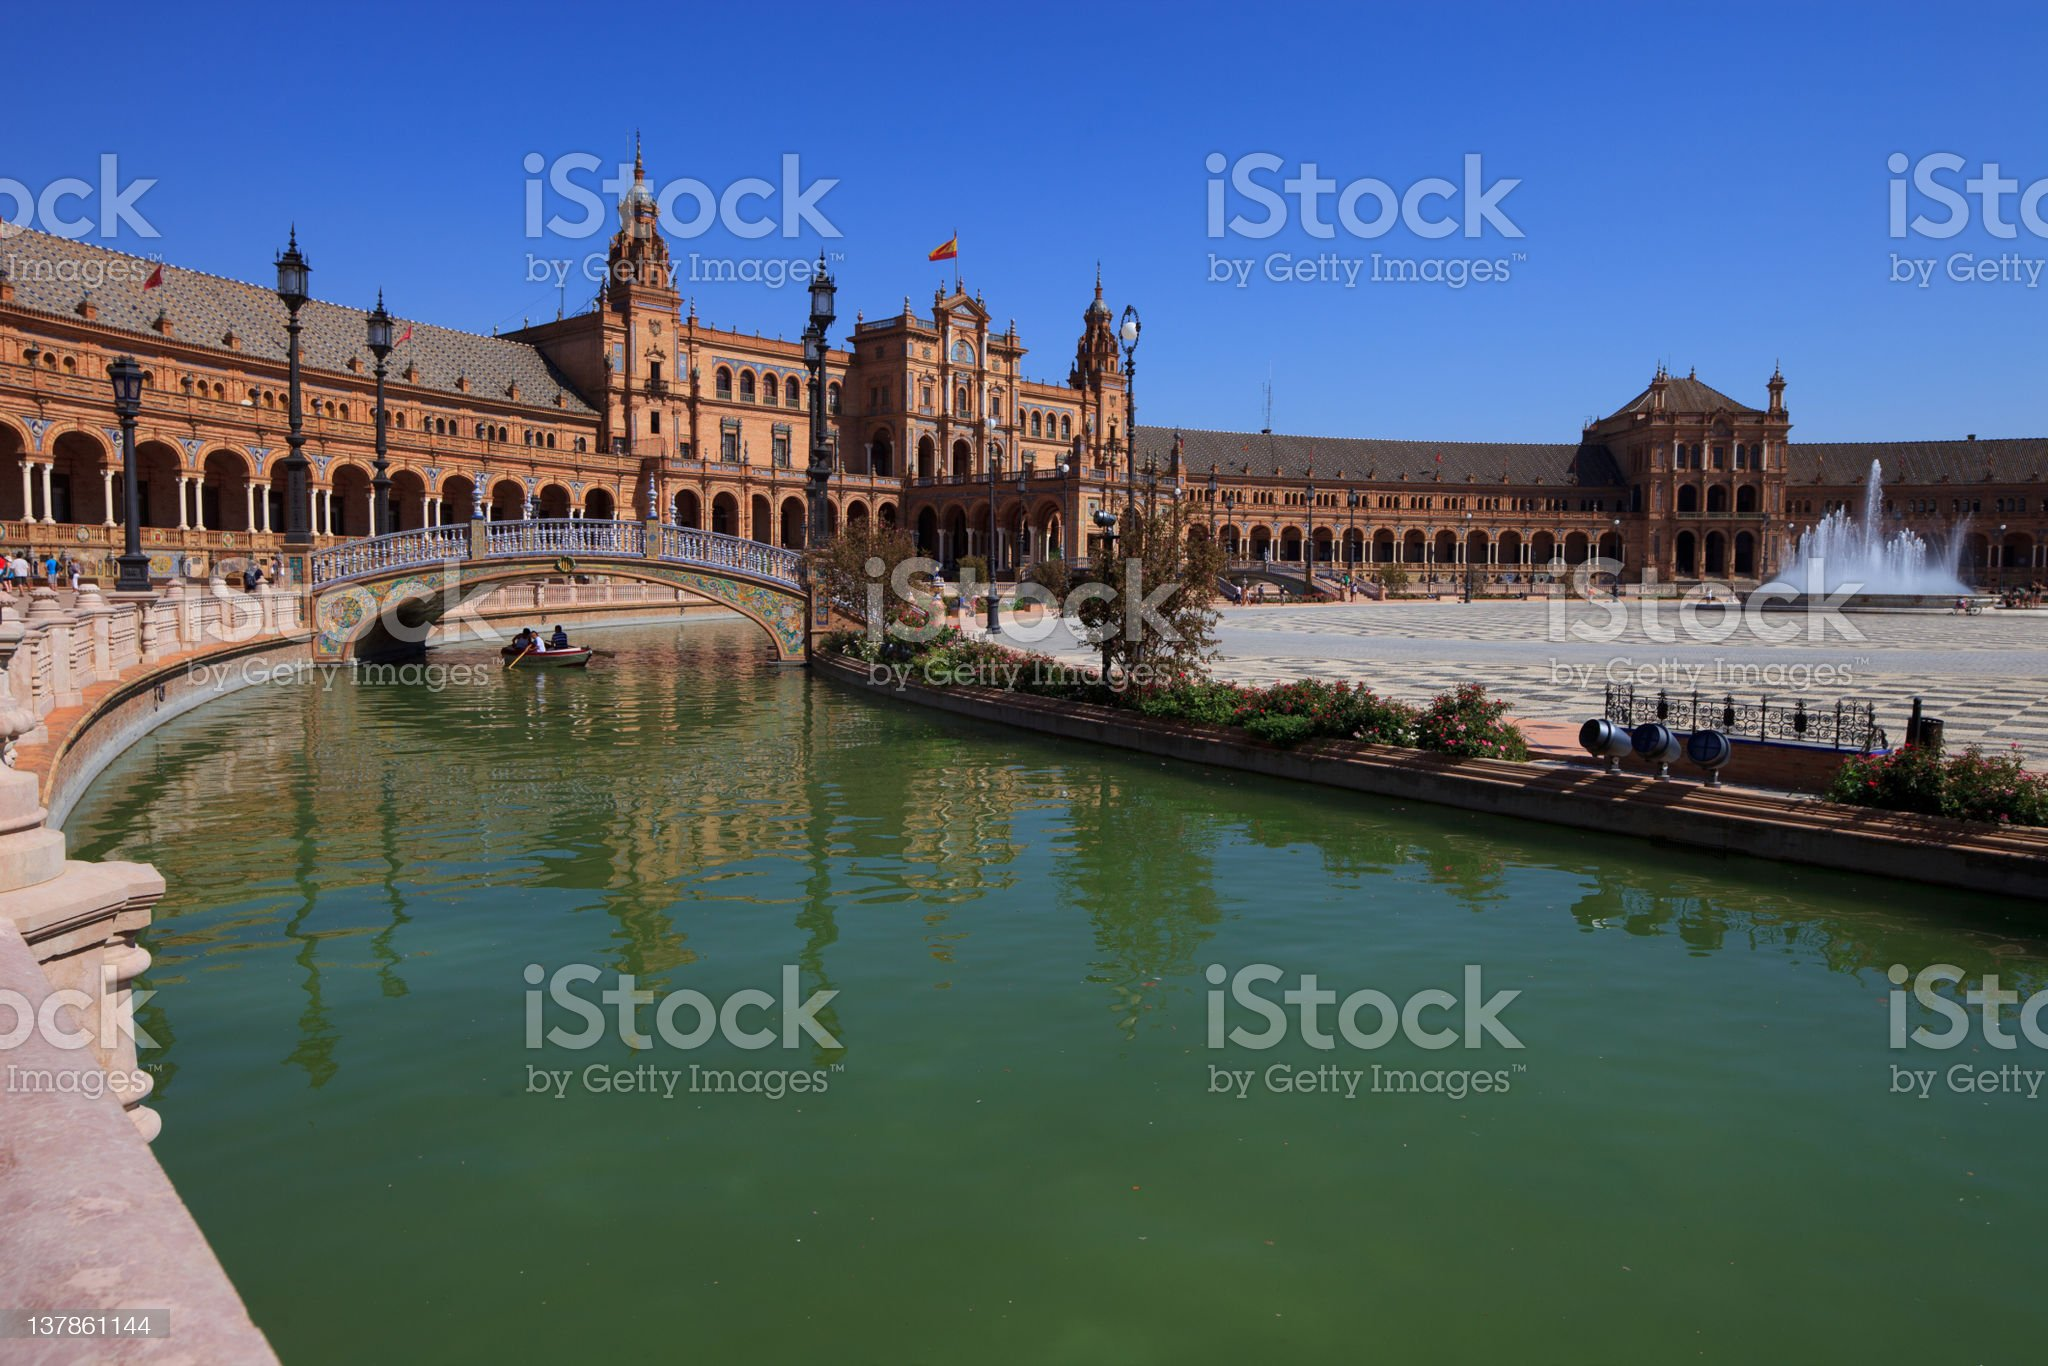 Seville, plaza de espana (spain square) royalty-free stock photo